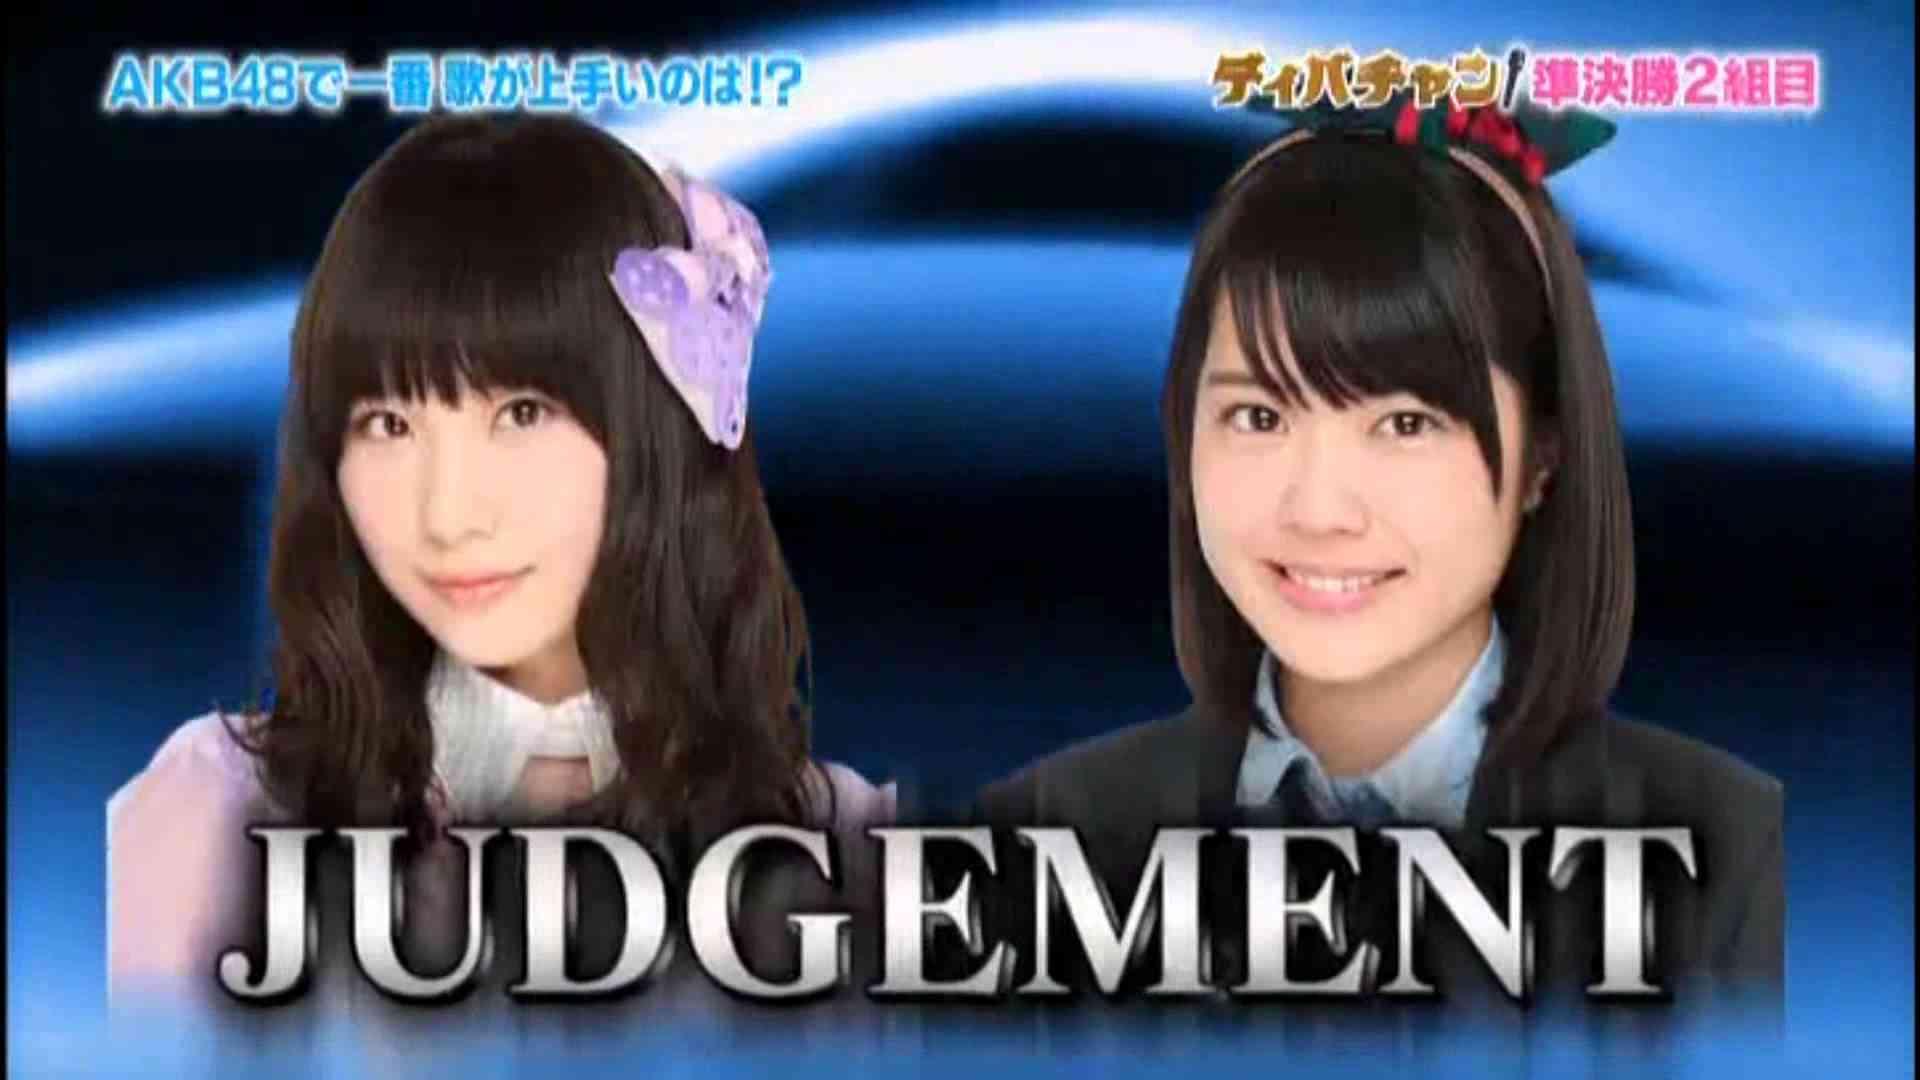 AKB48チーム8小田えりな 圧巻の歌声 - YouTube